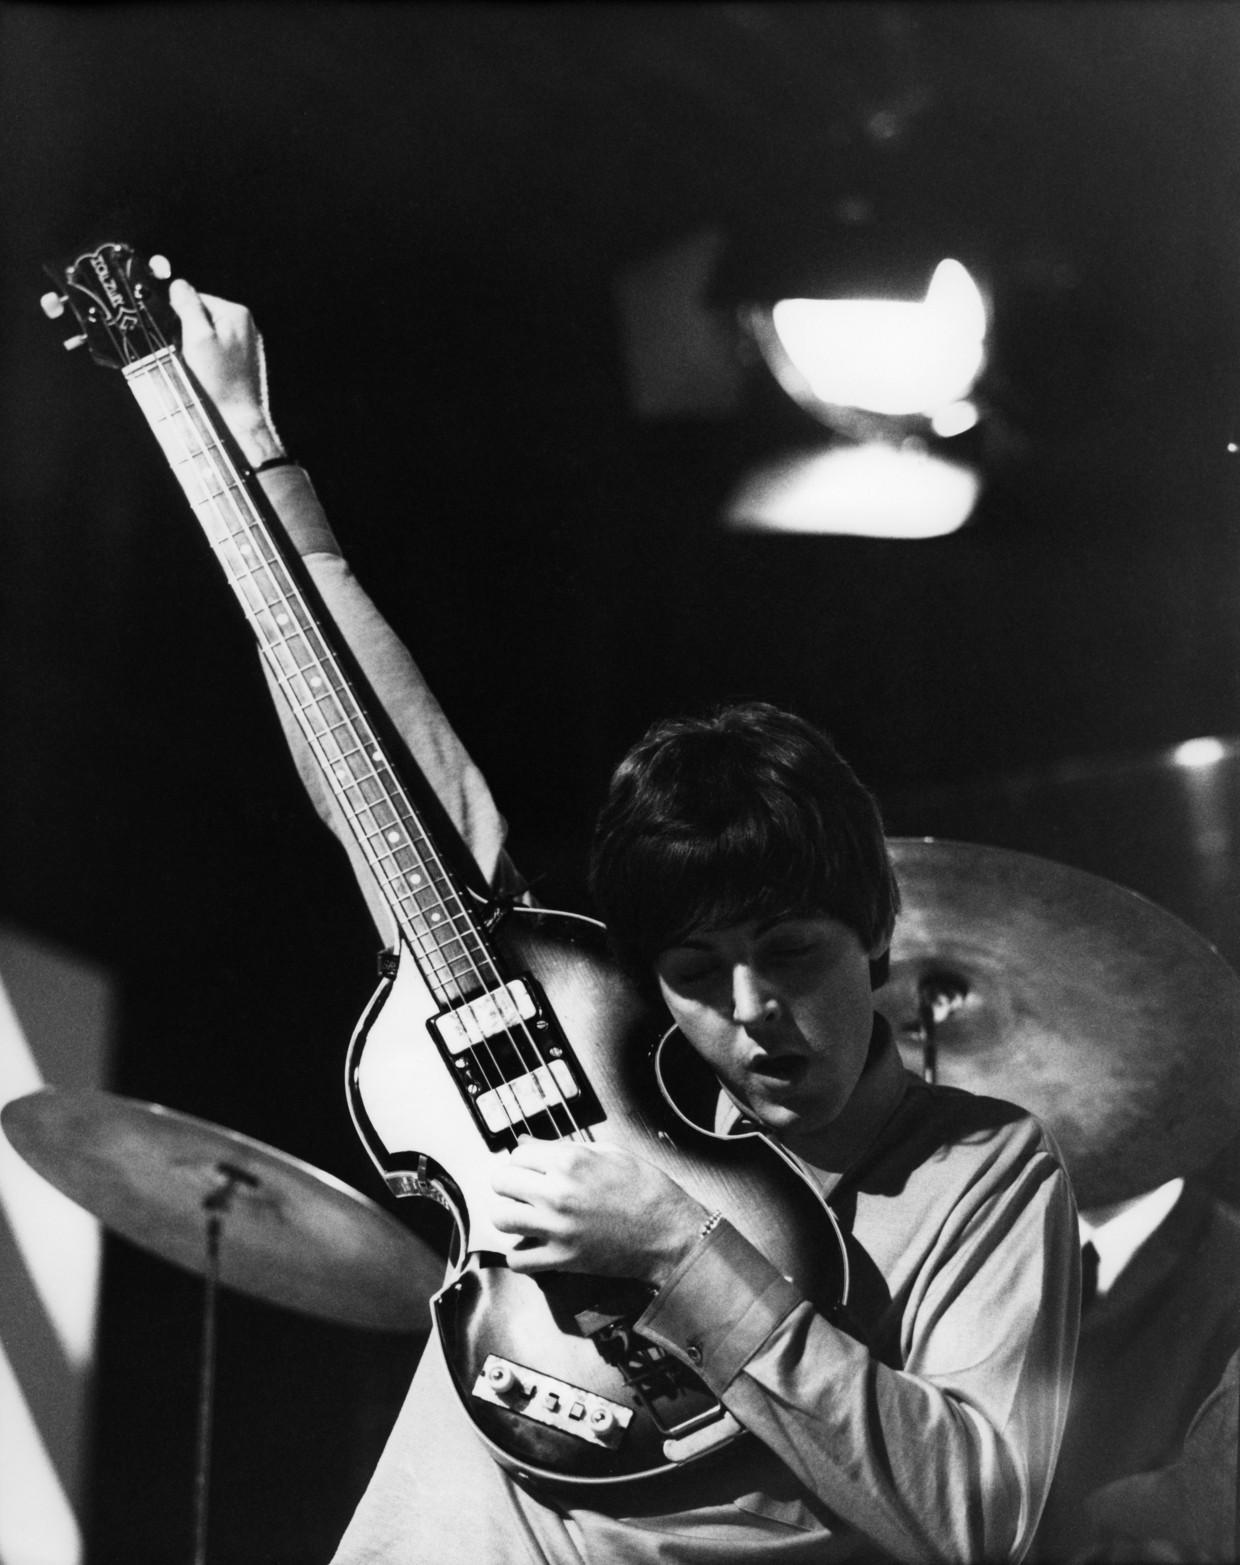 Paul McCartney van The Beatles in de Teddington Studios in London, 11 juni 1964.